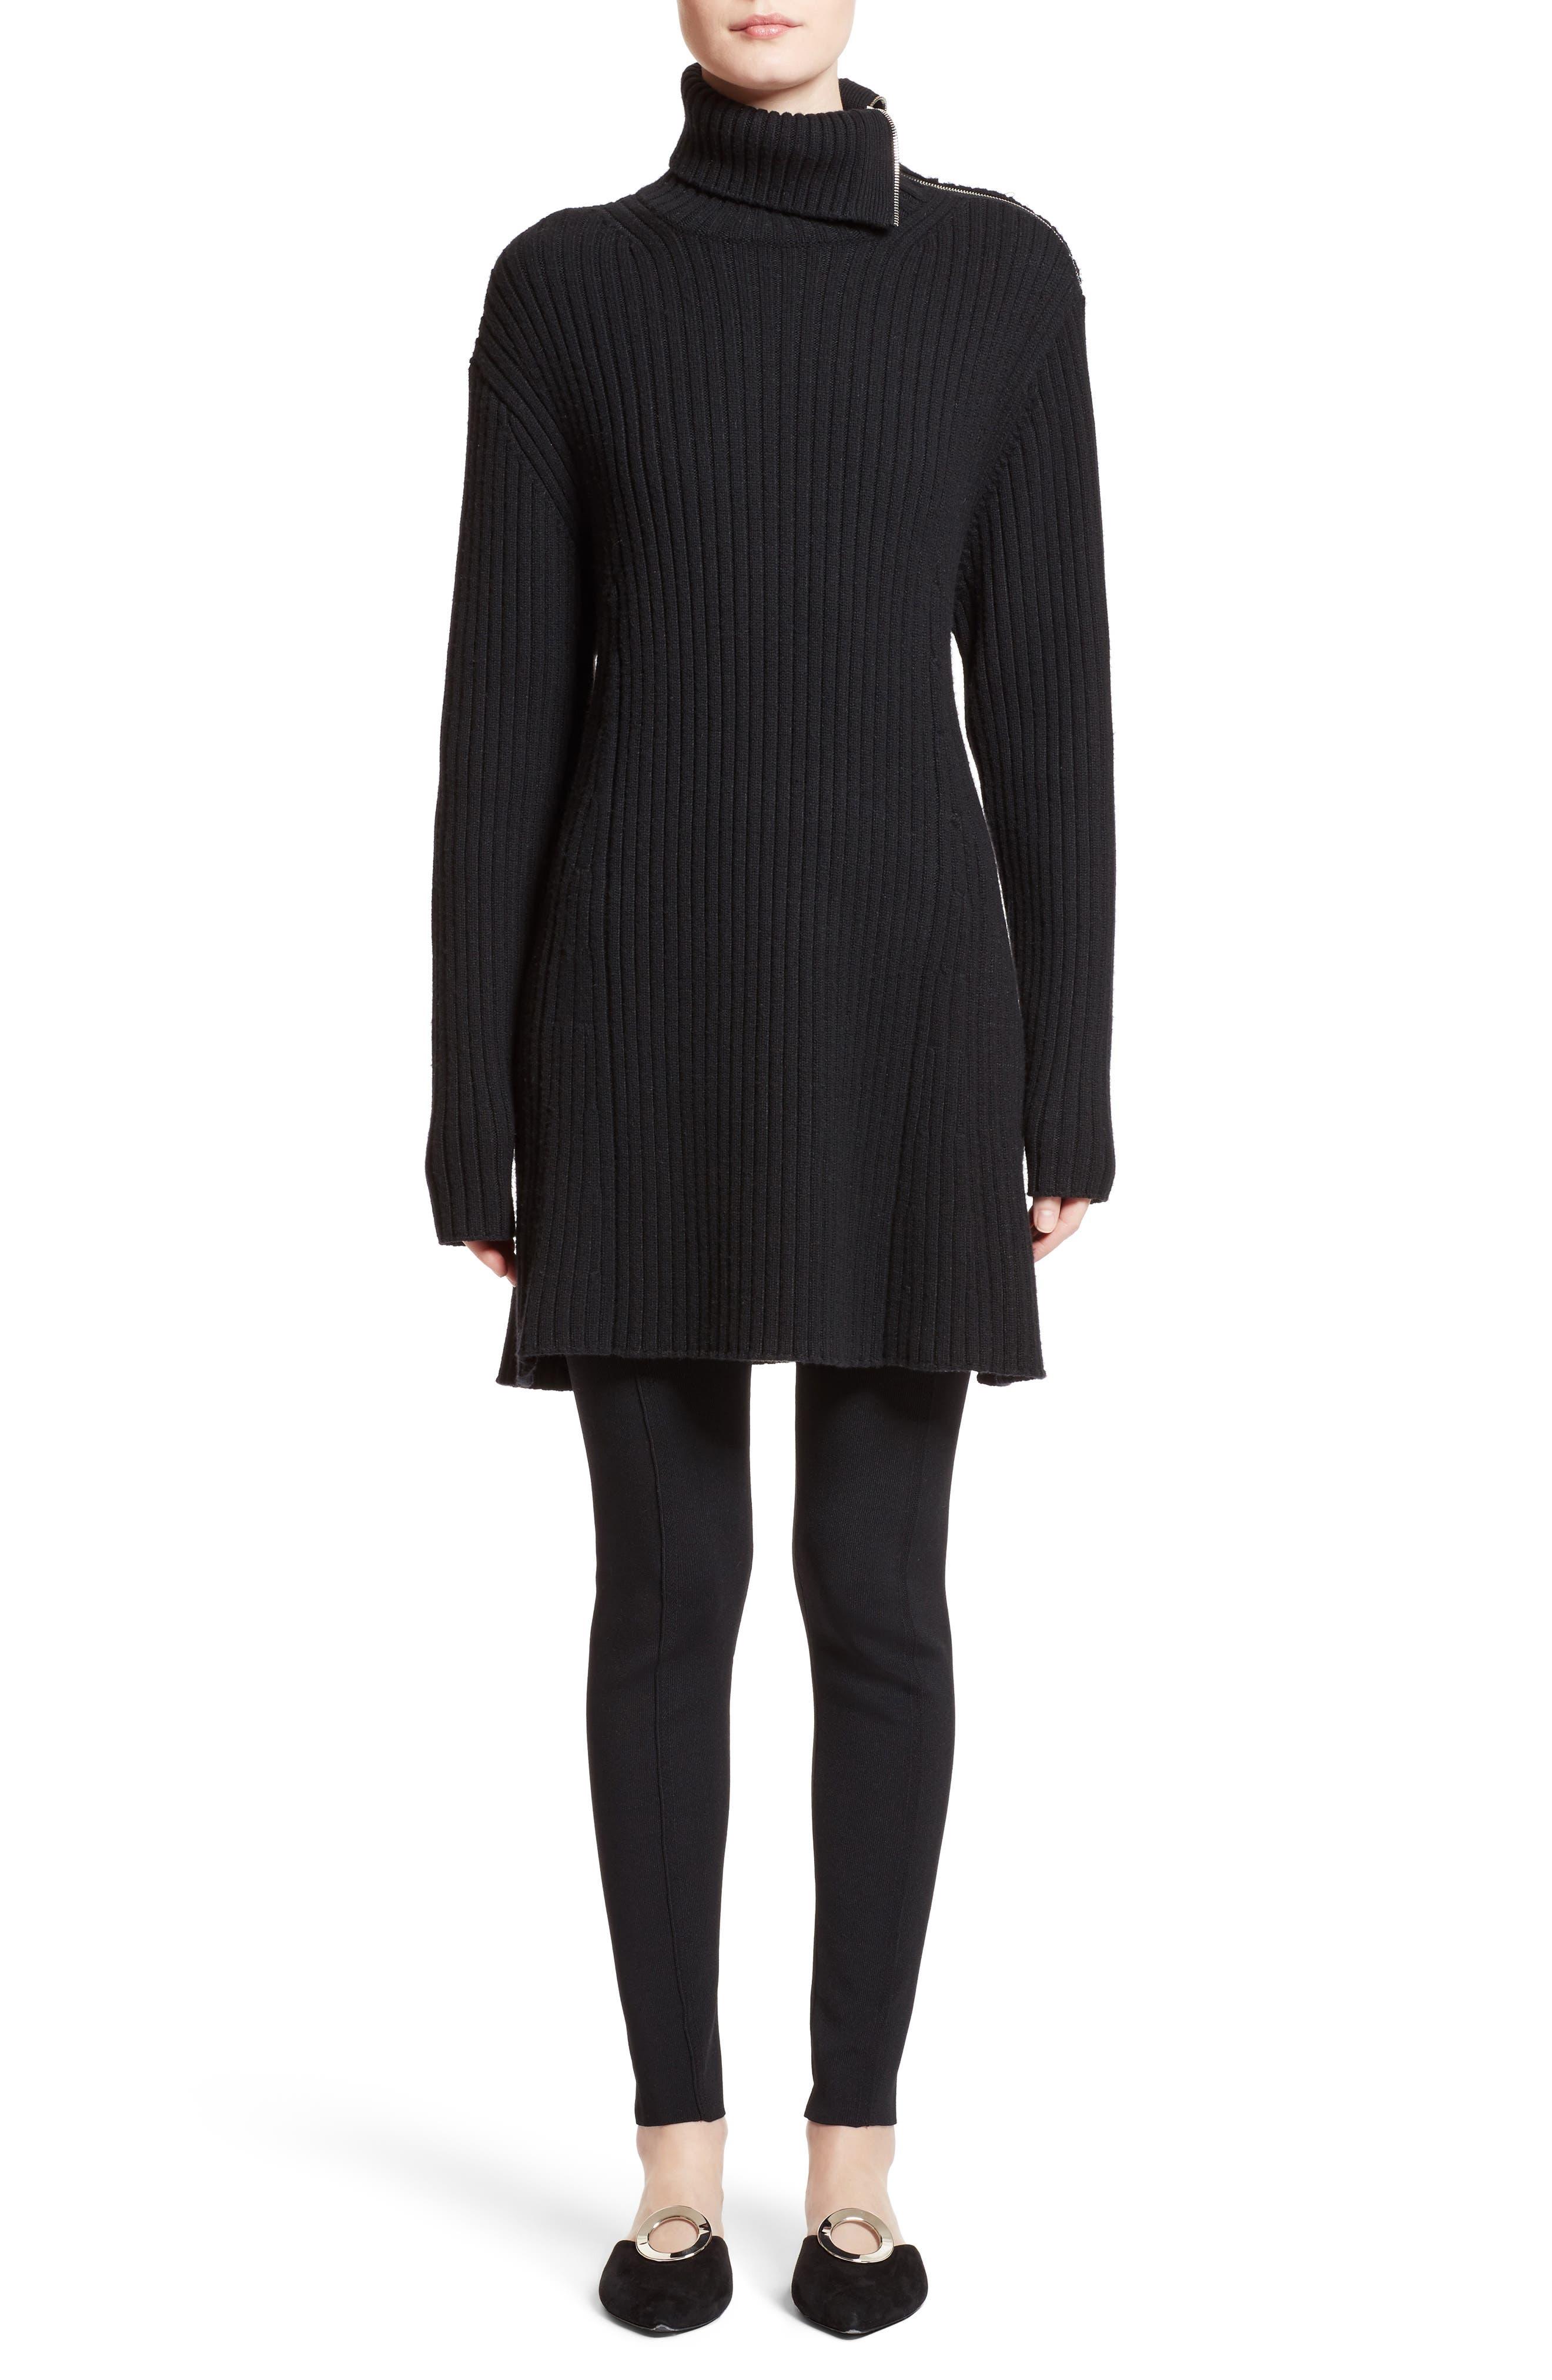 Wool & Cashmere Blend Turtleneck Dress,                             Alternate thumbnail 7, color,                             Black